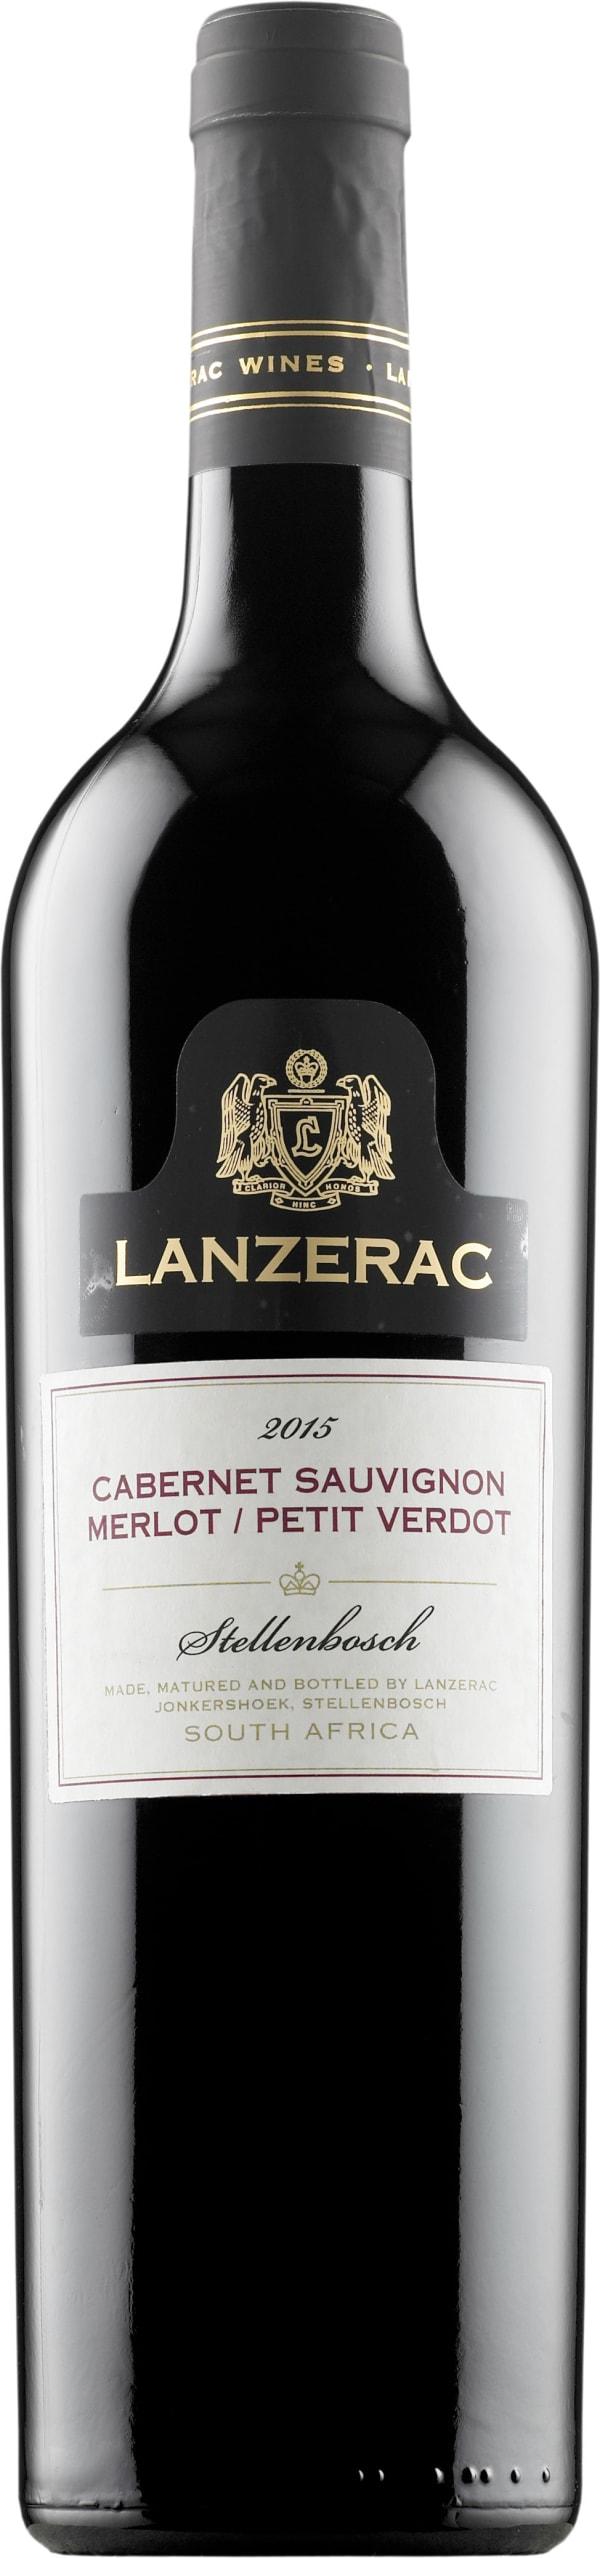 Lanzerac Cabernet Sauvignon Merlot Petit Verdot 2016